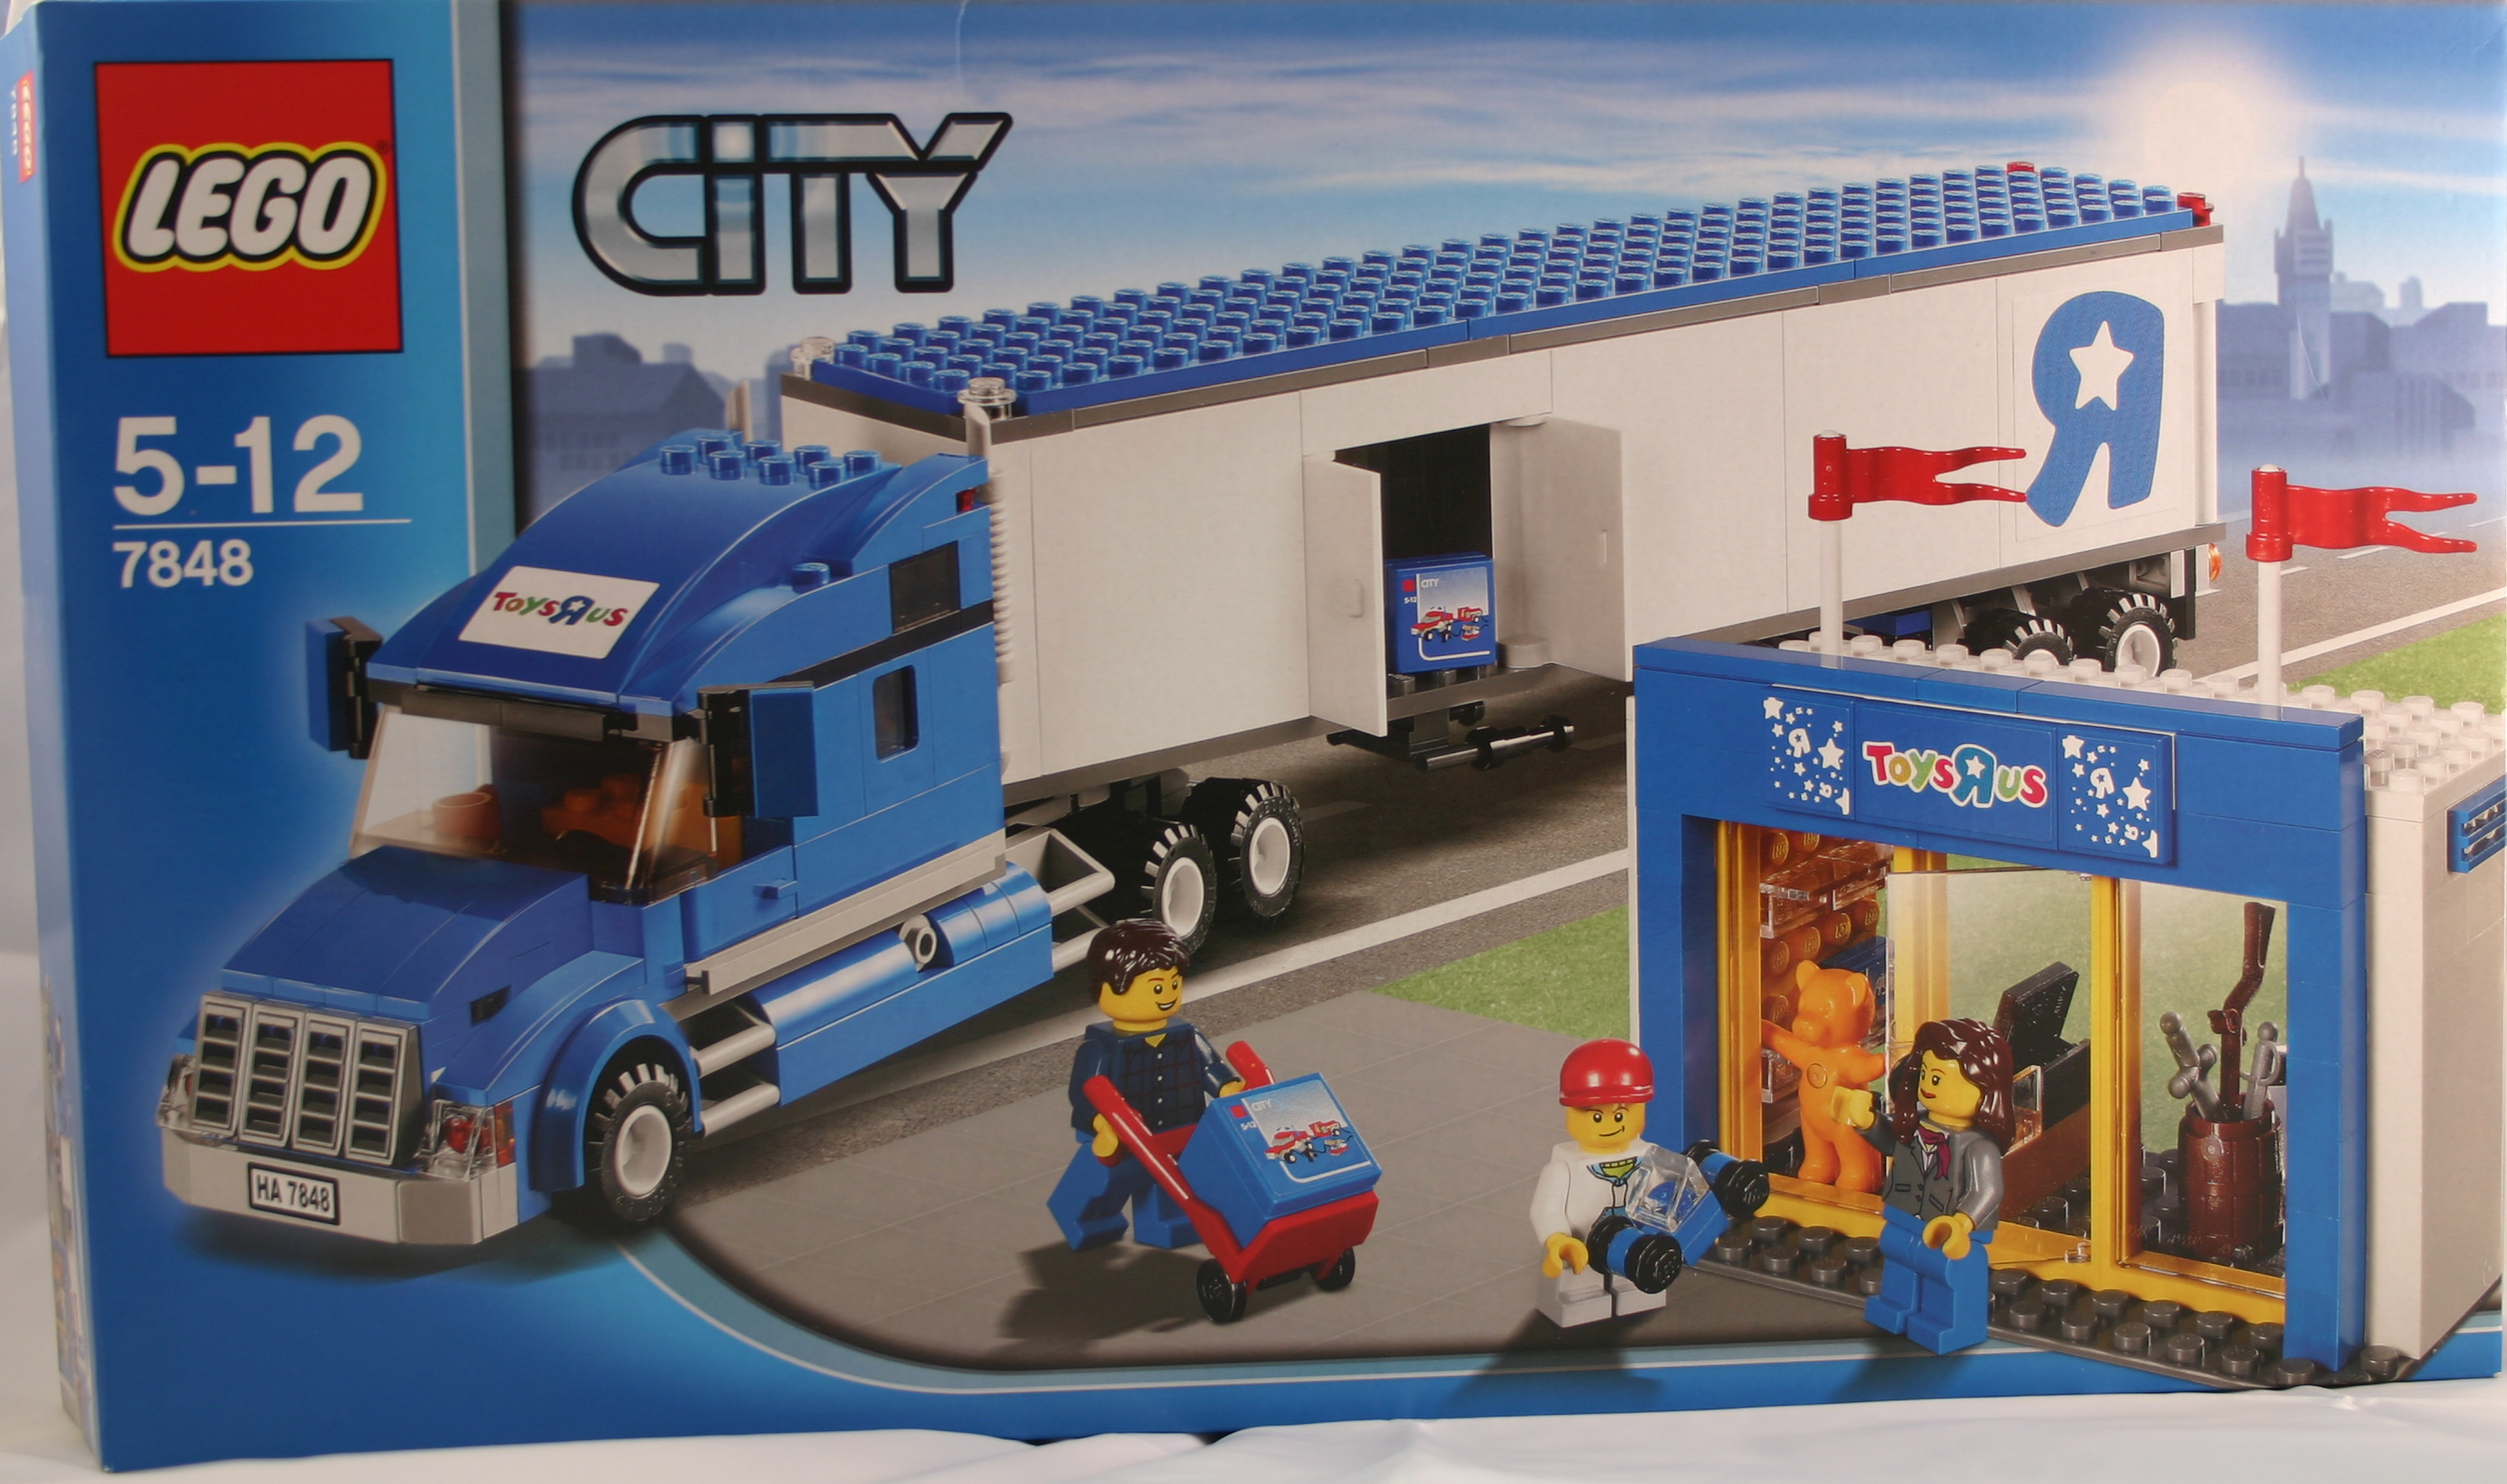 LKW (Toys 'R Us) 7848